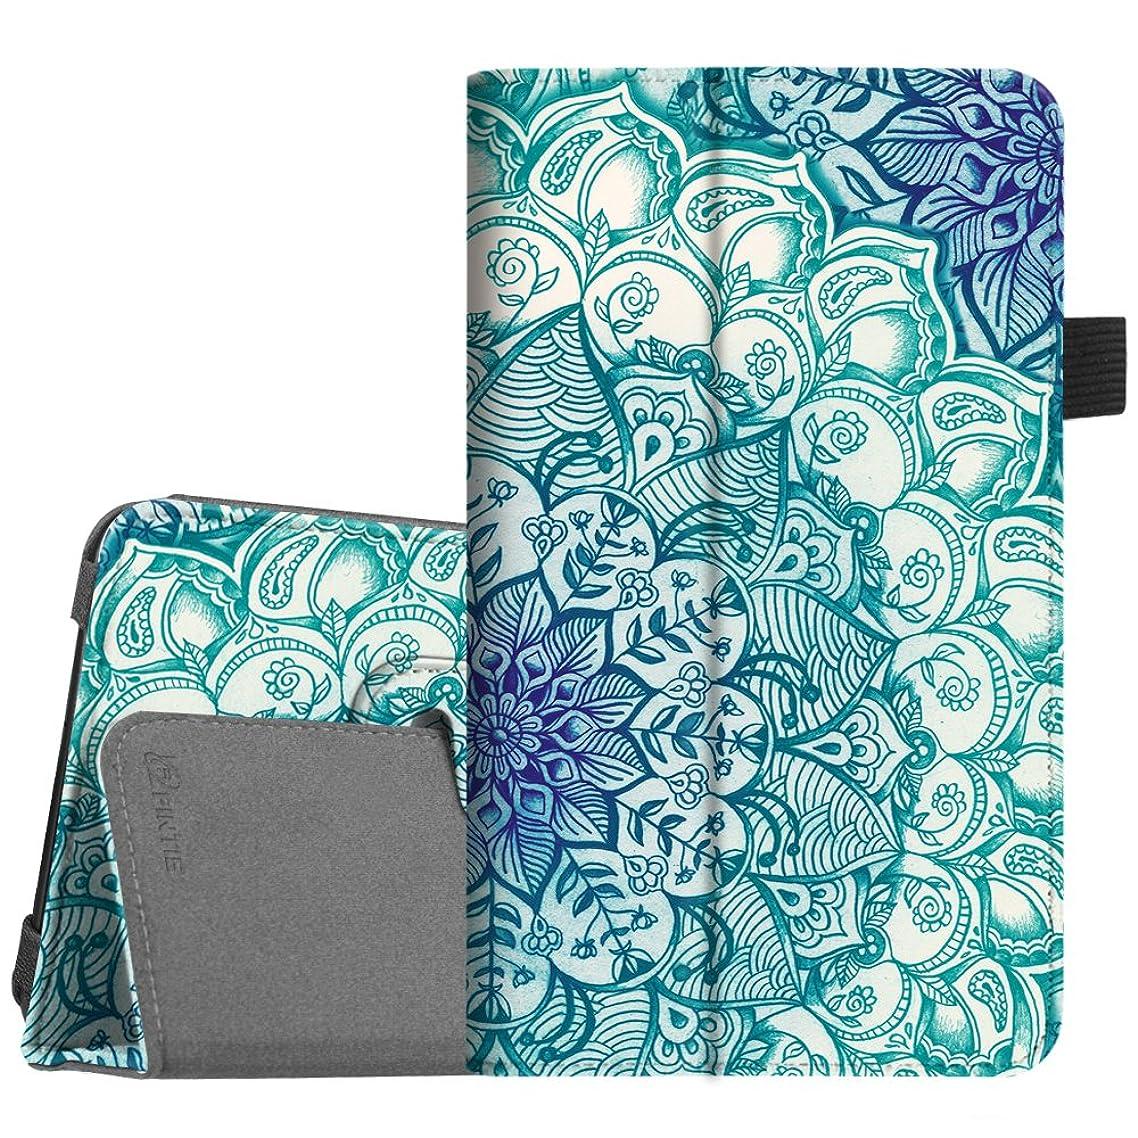 Fintie Folio Case for Samsung Galaxy Tab A 7.0 - Premium Vegan Leather Slim Fit Folio Stand Cover for Samsung Galaxy Tab A 7.0 Tablet 2016 Release (SM-T280/SM-T285), Emerald Illusions